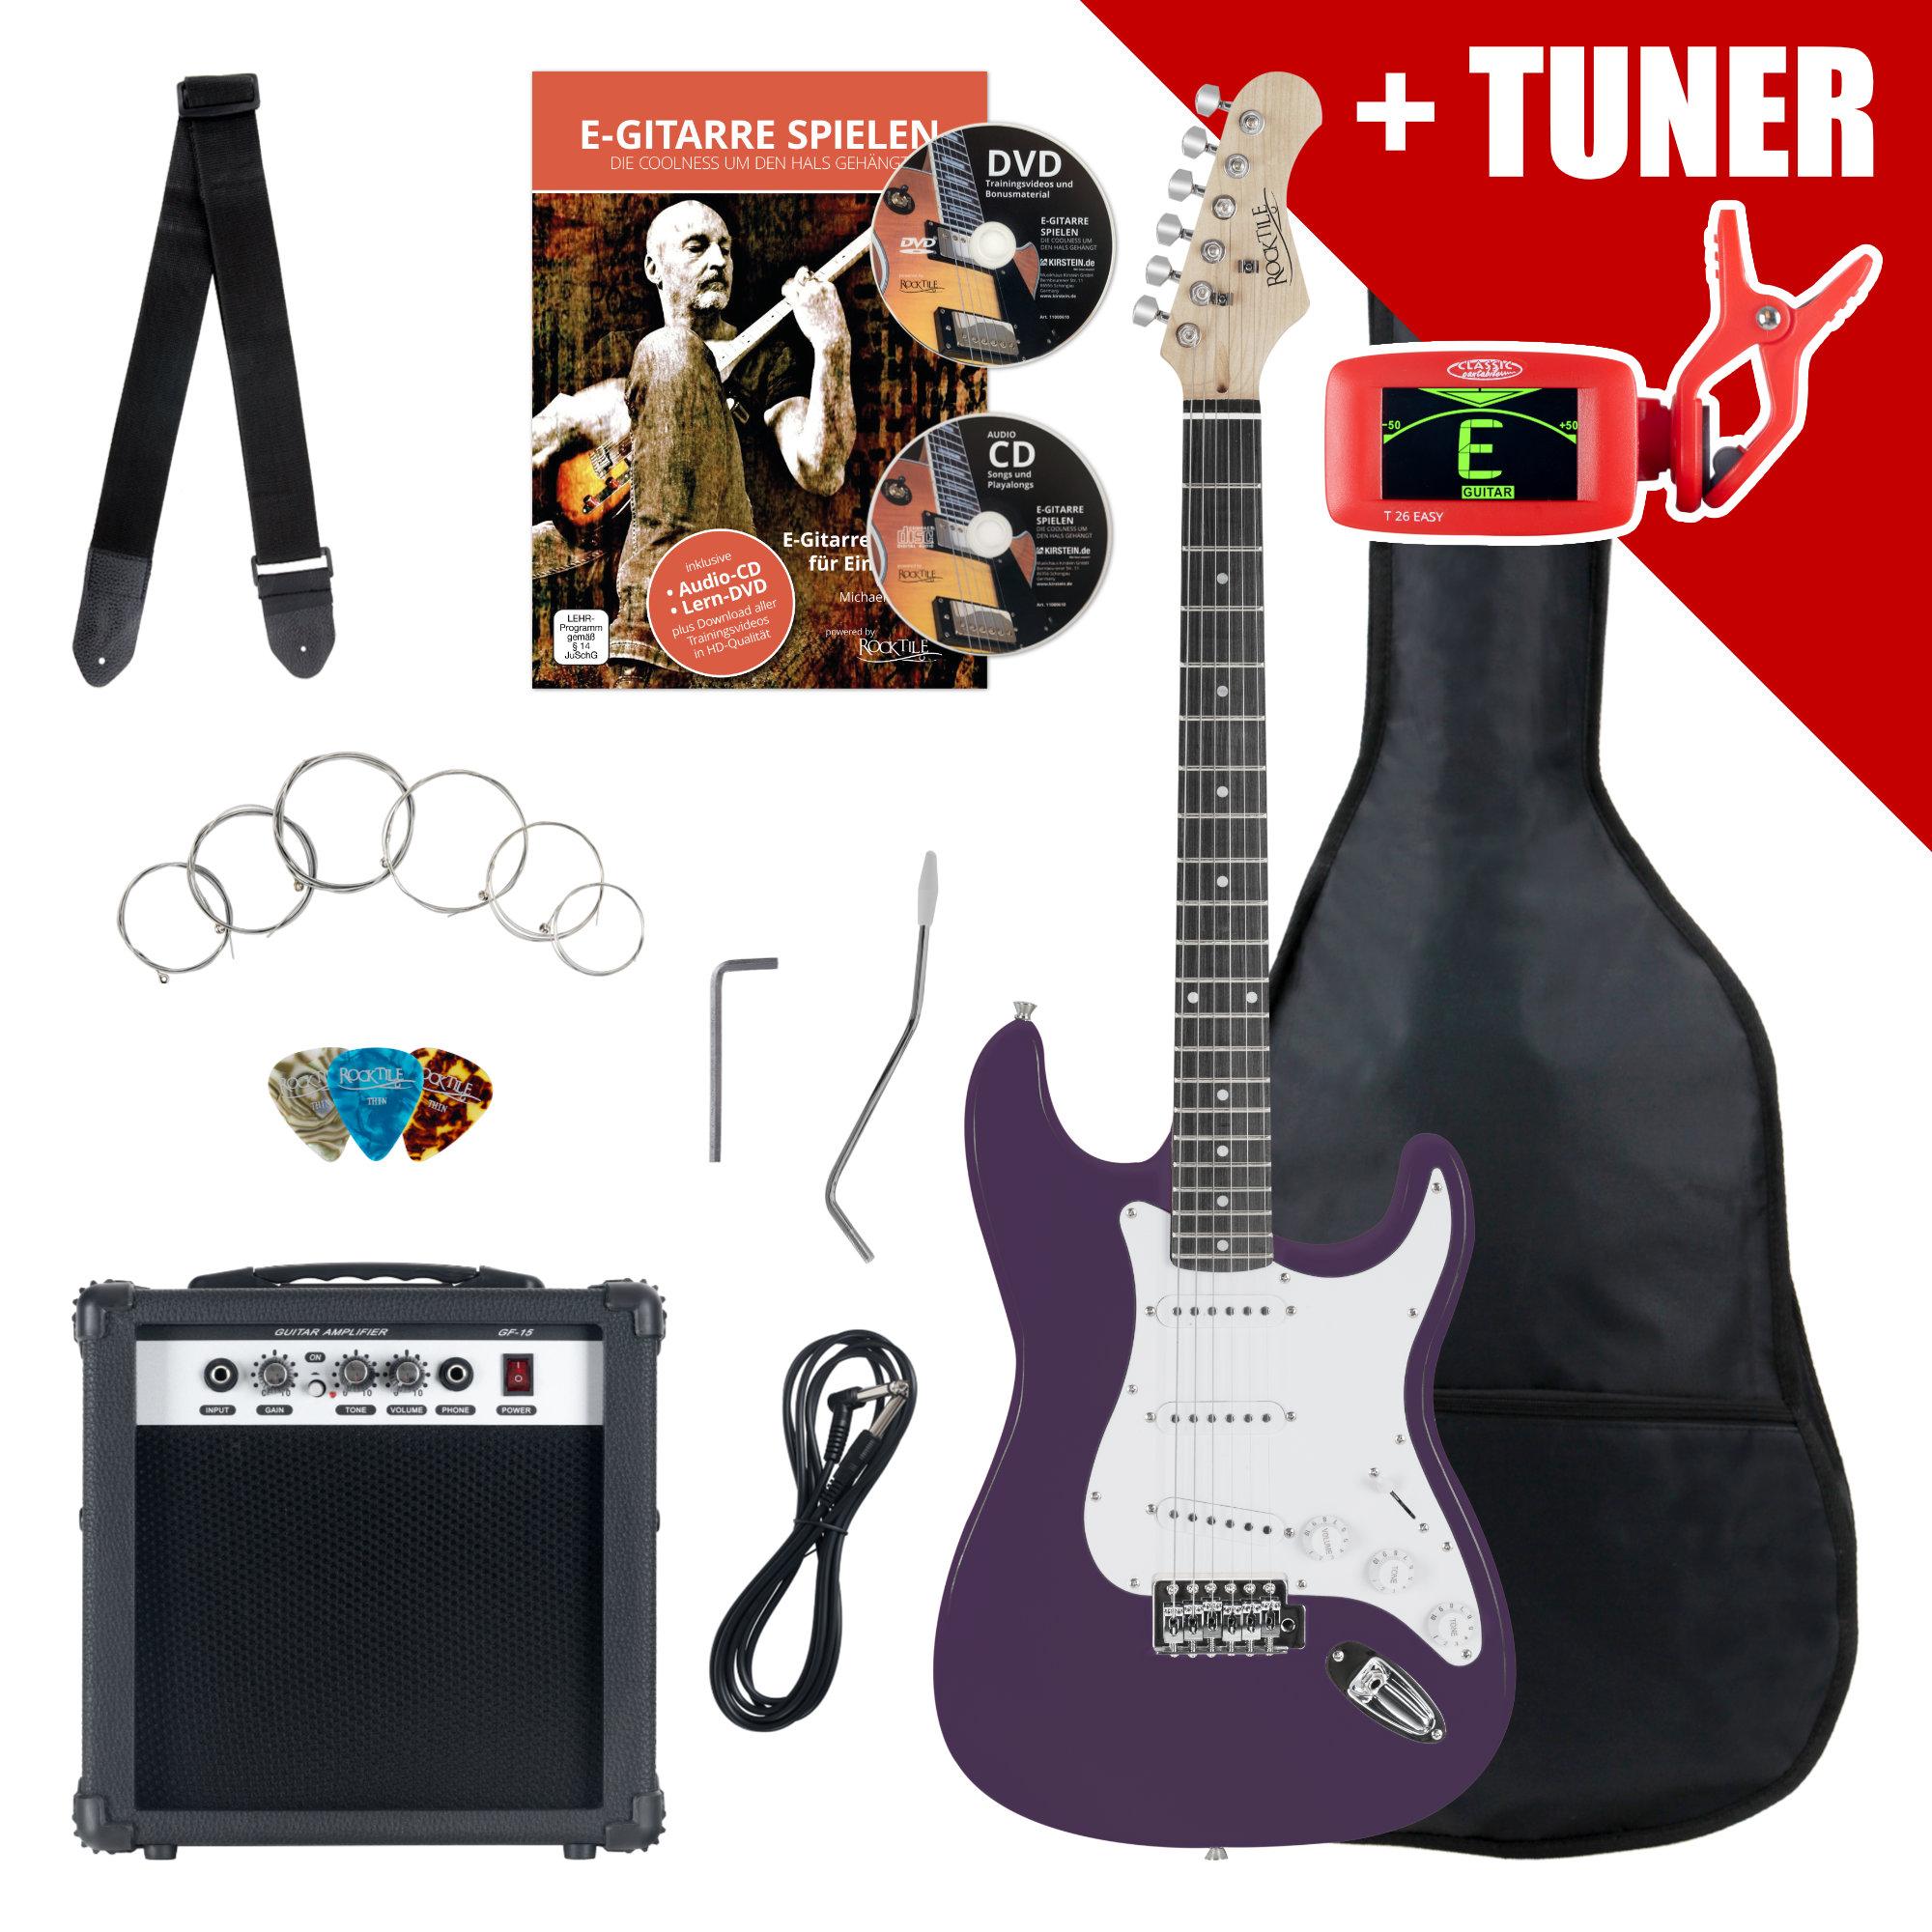 Rocktile ST Pack E Gitarre Set Purple inkl. Verstärker, Tasche, Stimmgerät, Kabel, Gurt, Saiten und Schule inkl. CD|DVD